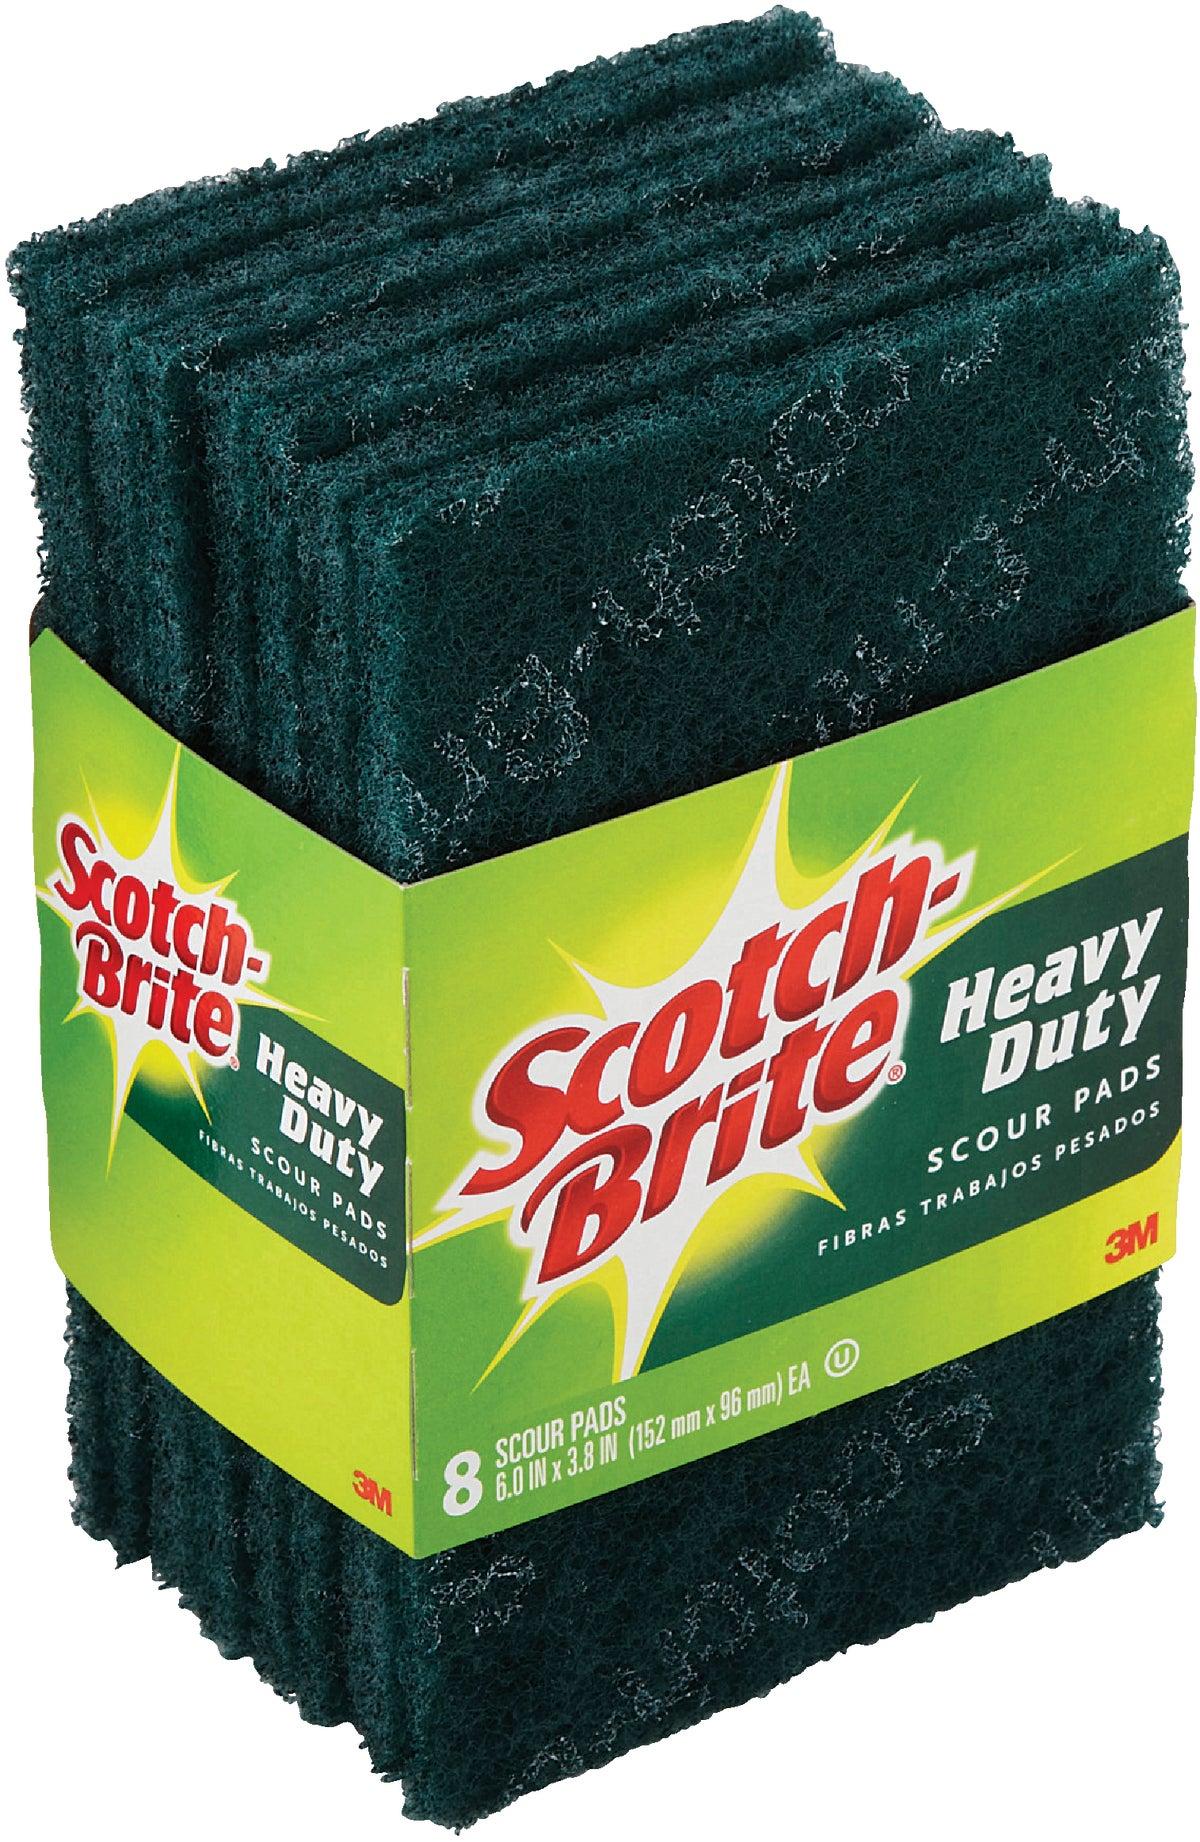 Buy 3m Scotch Brite Heavy Duty Scouring Pad